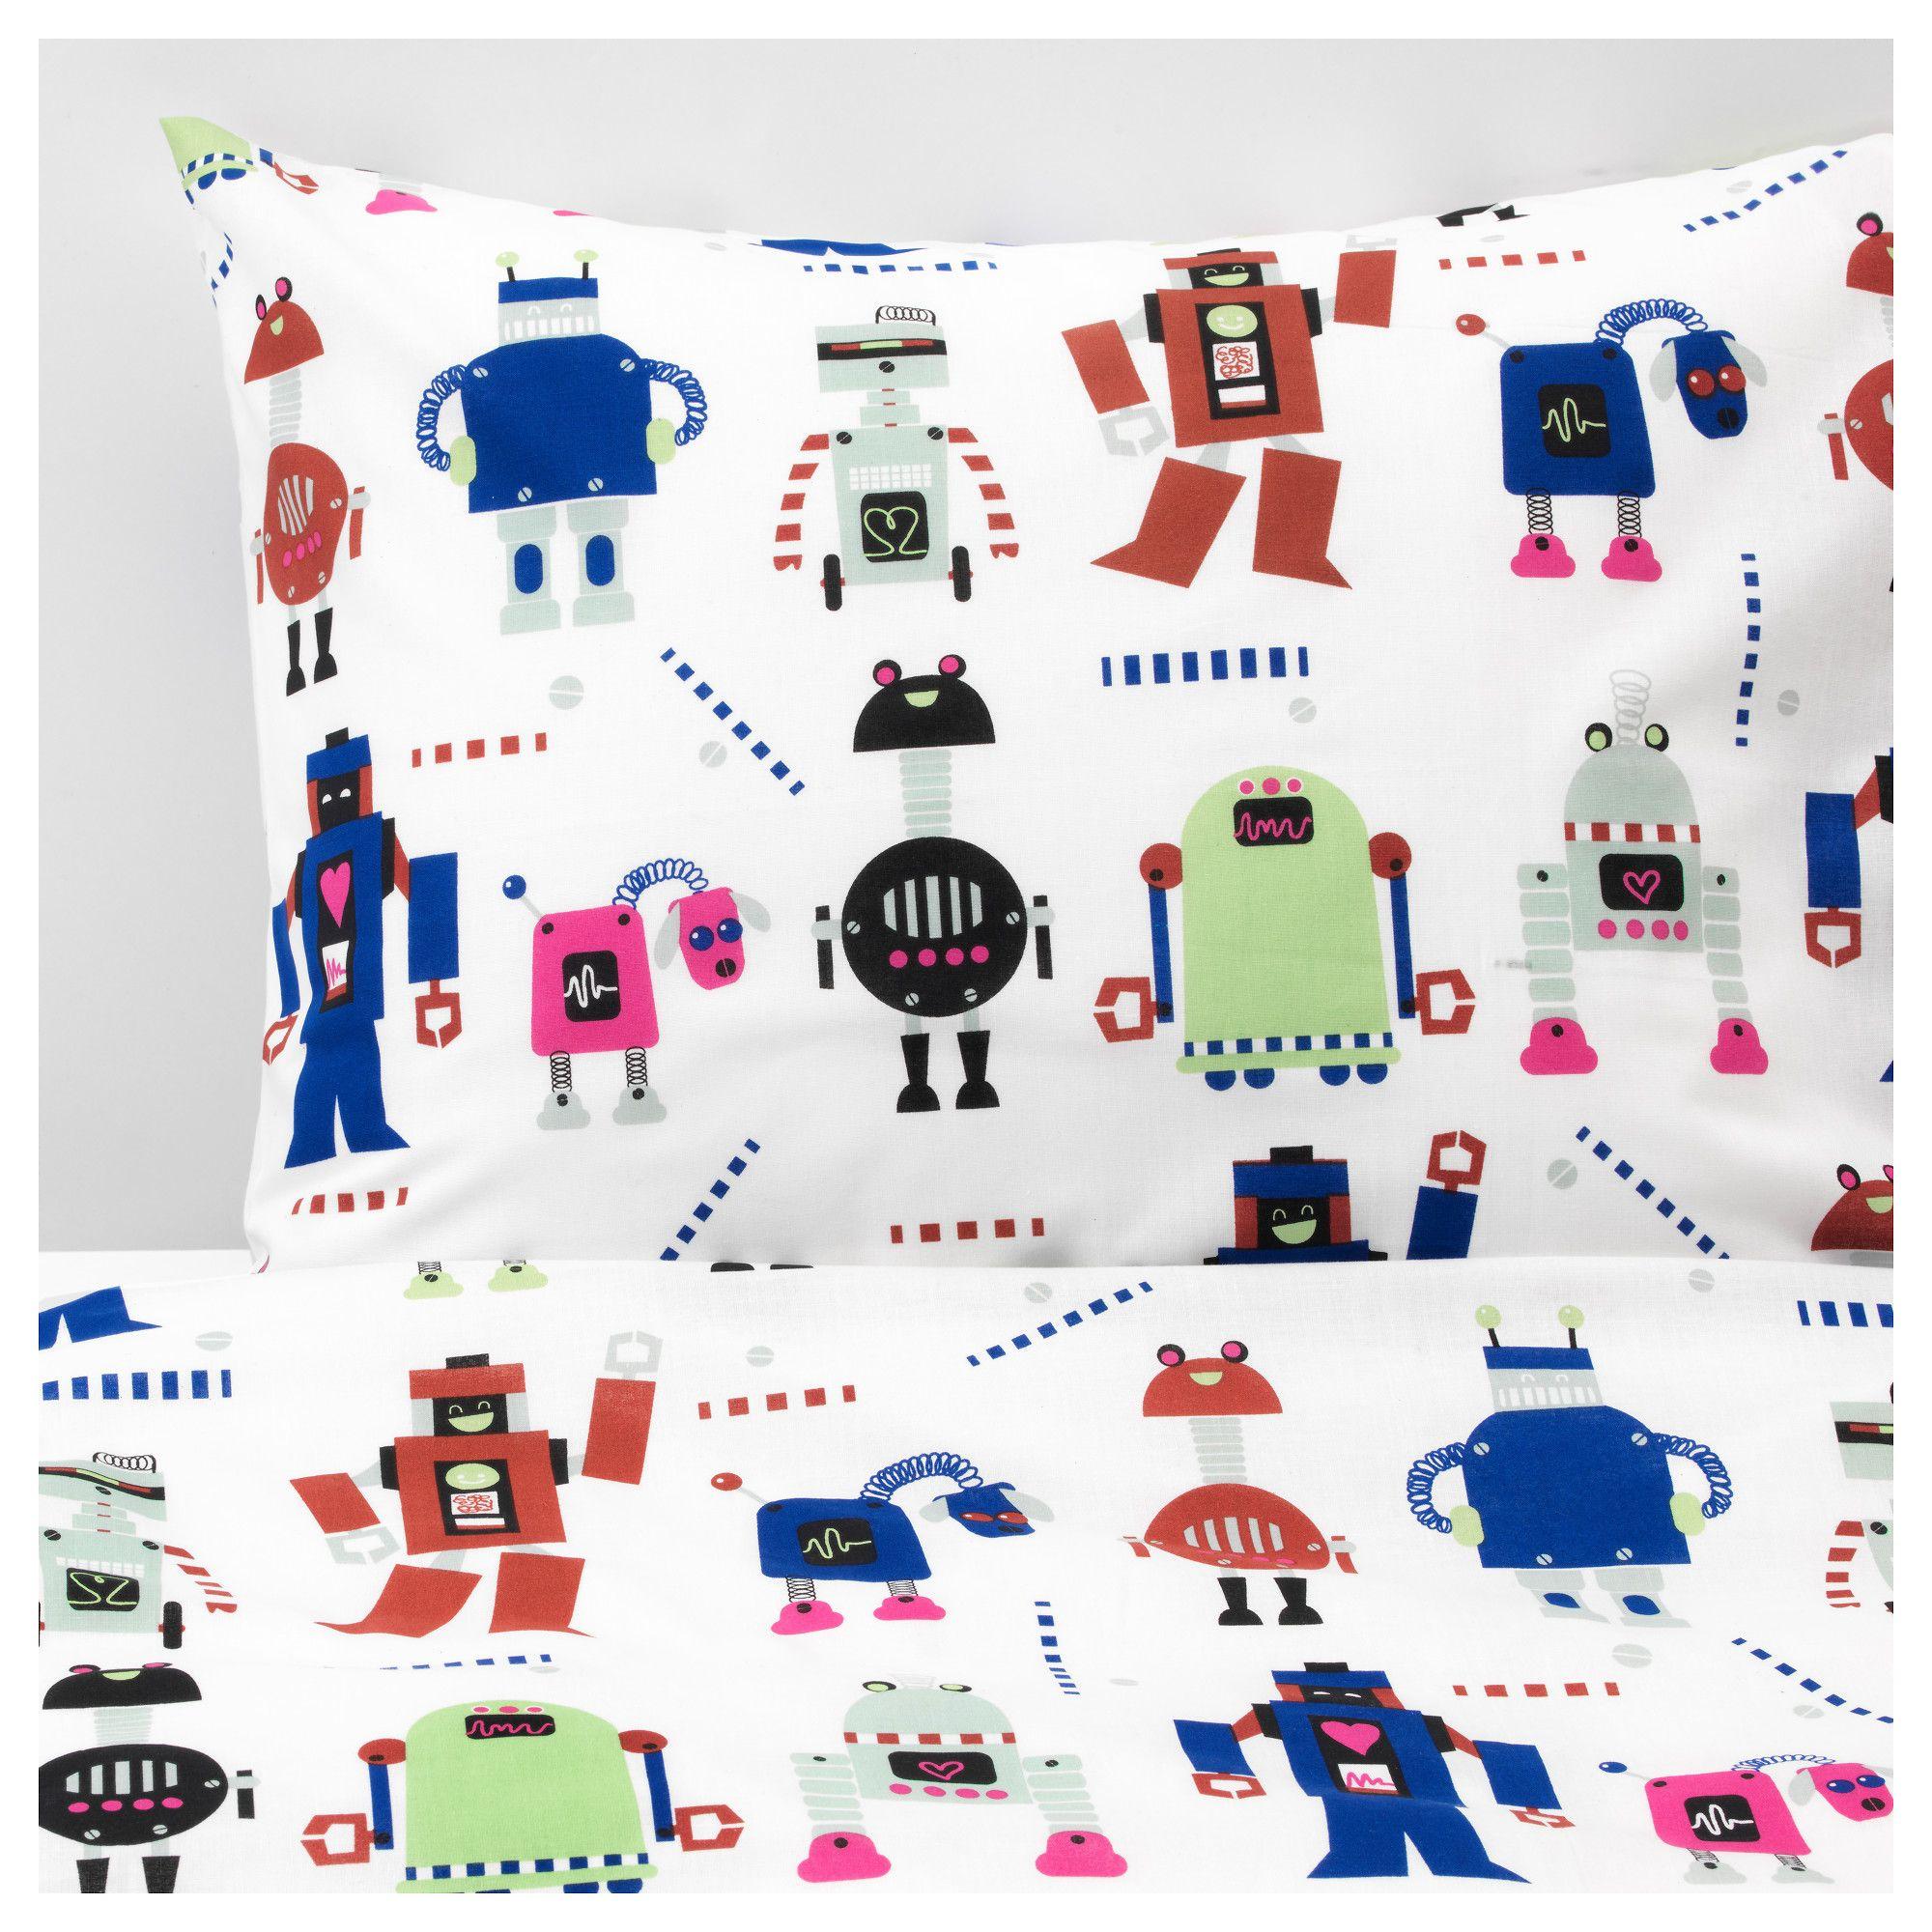 Ikea Lattjo Duvet Cover And Pillowcase S Small Robots